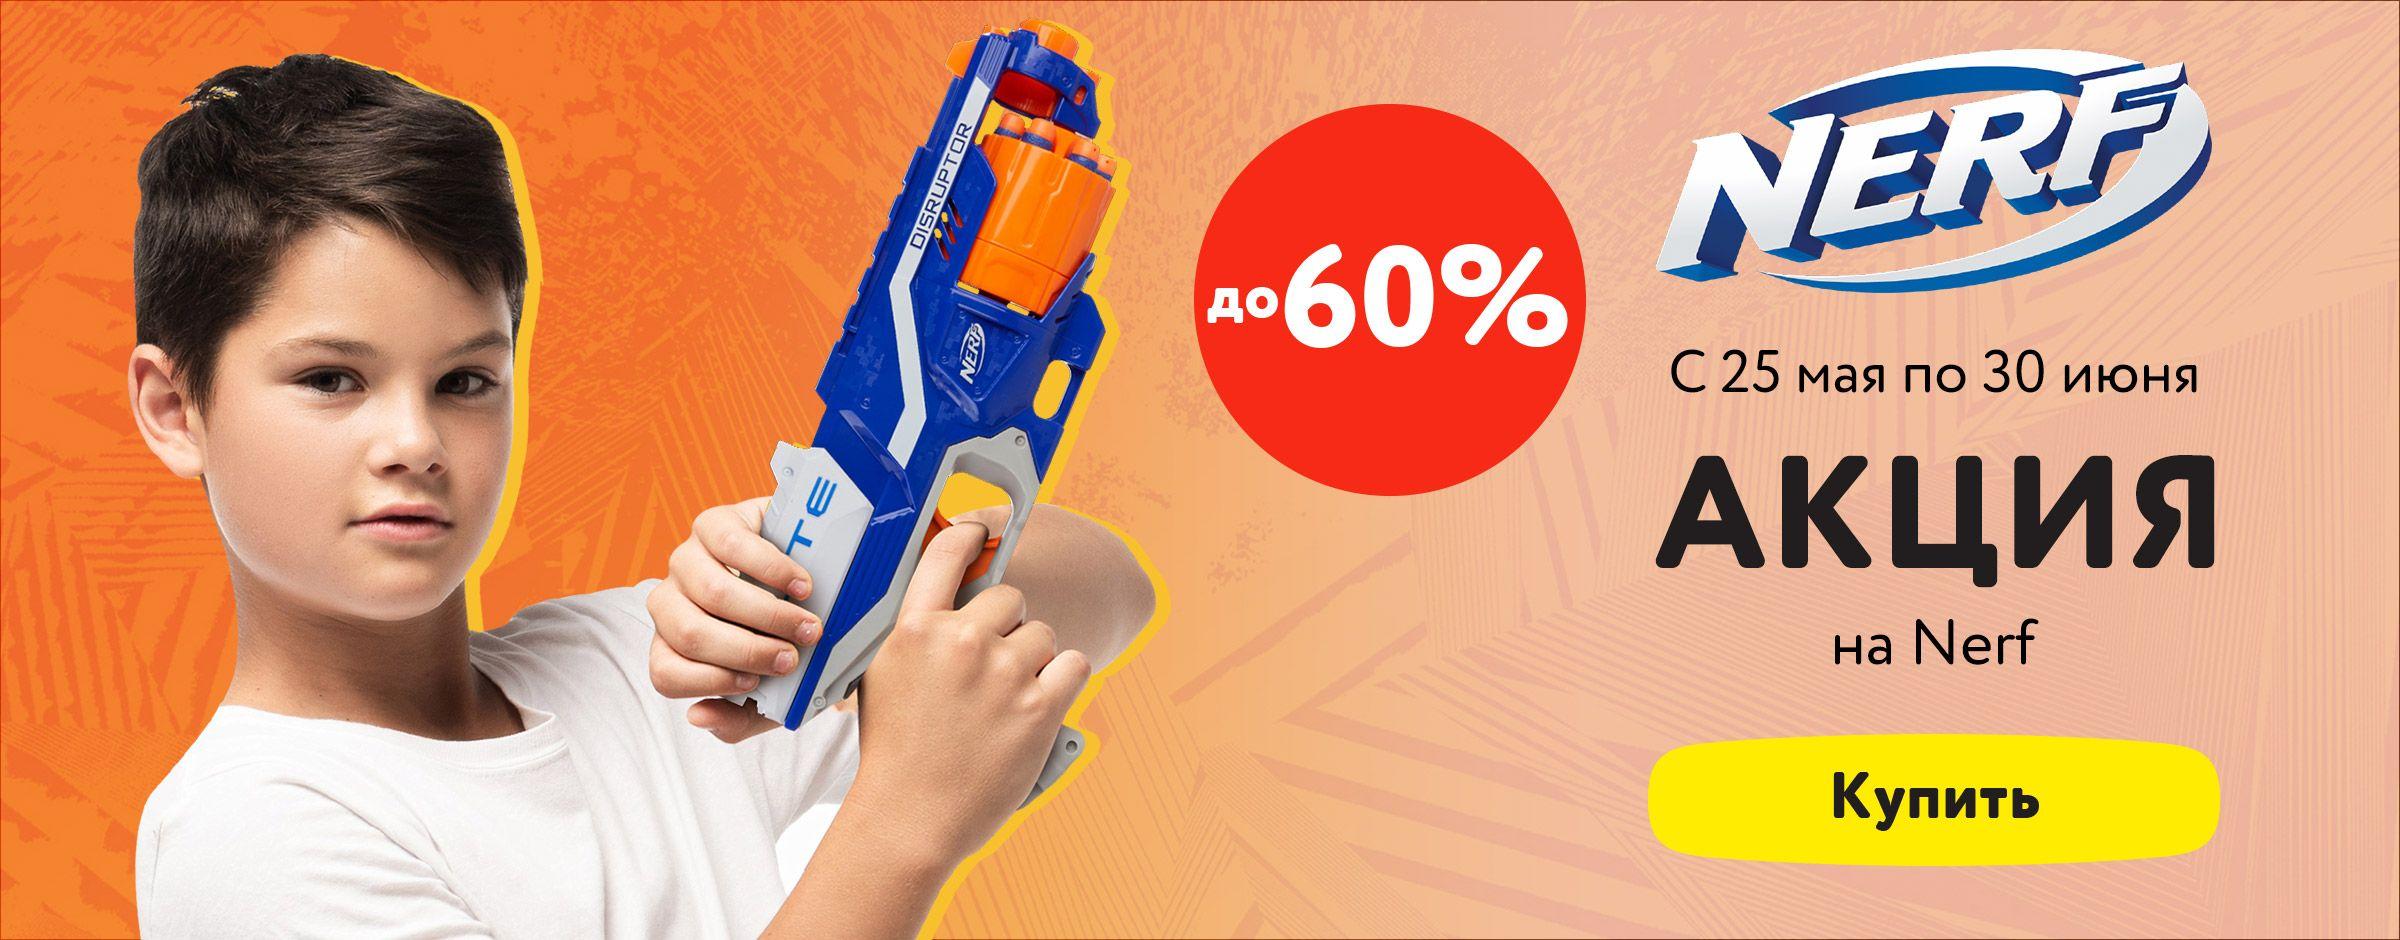 До 60% на Nerf